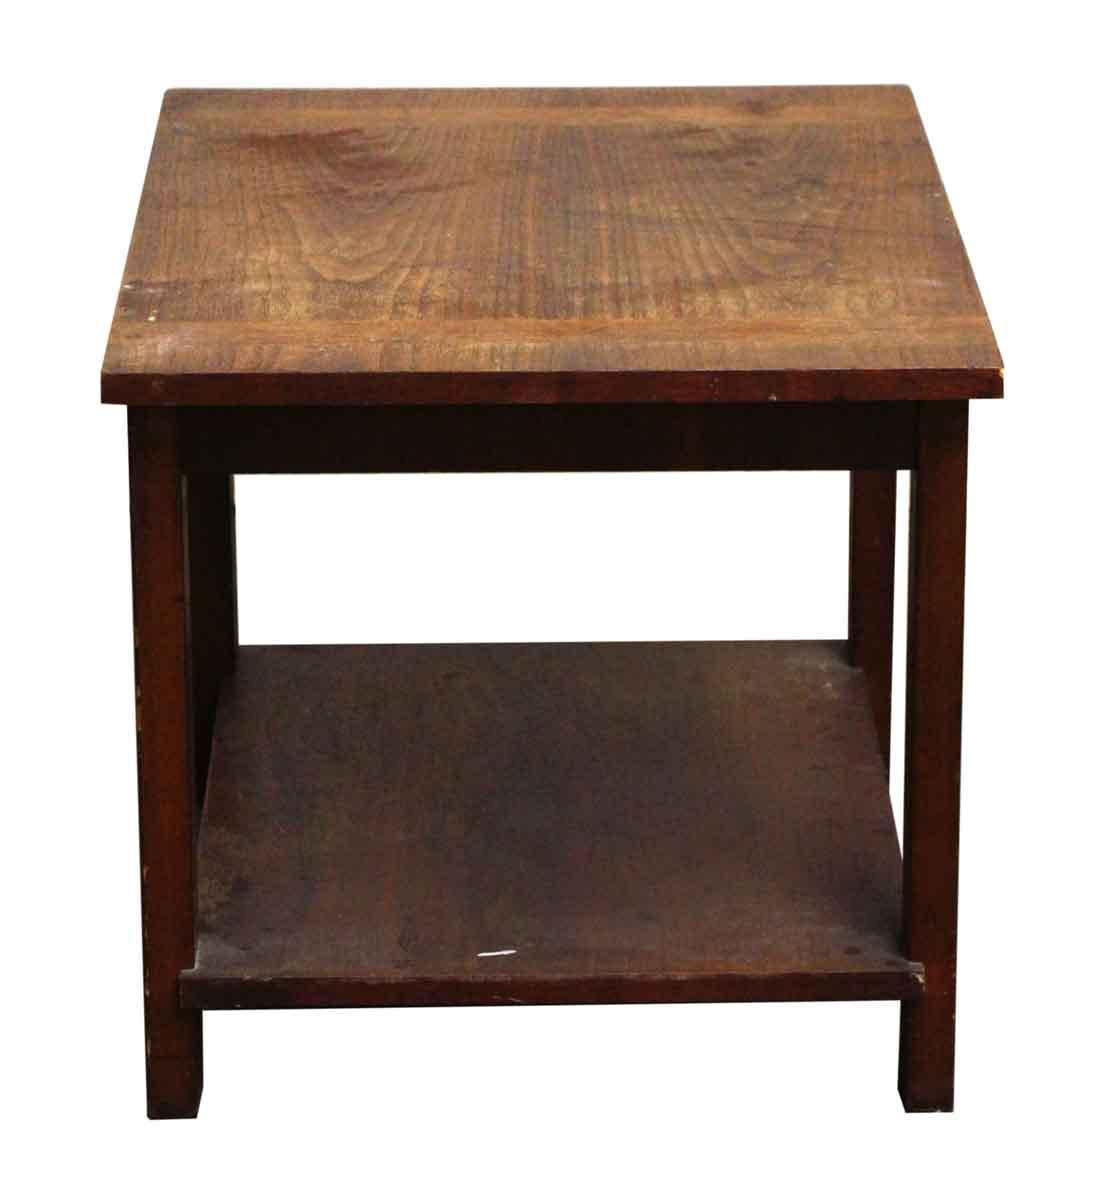 Rustic Pine Wood Coffee Table: Rustic Pine Coffee Table